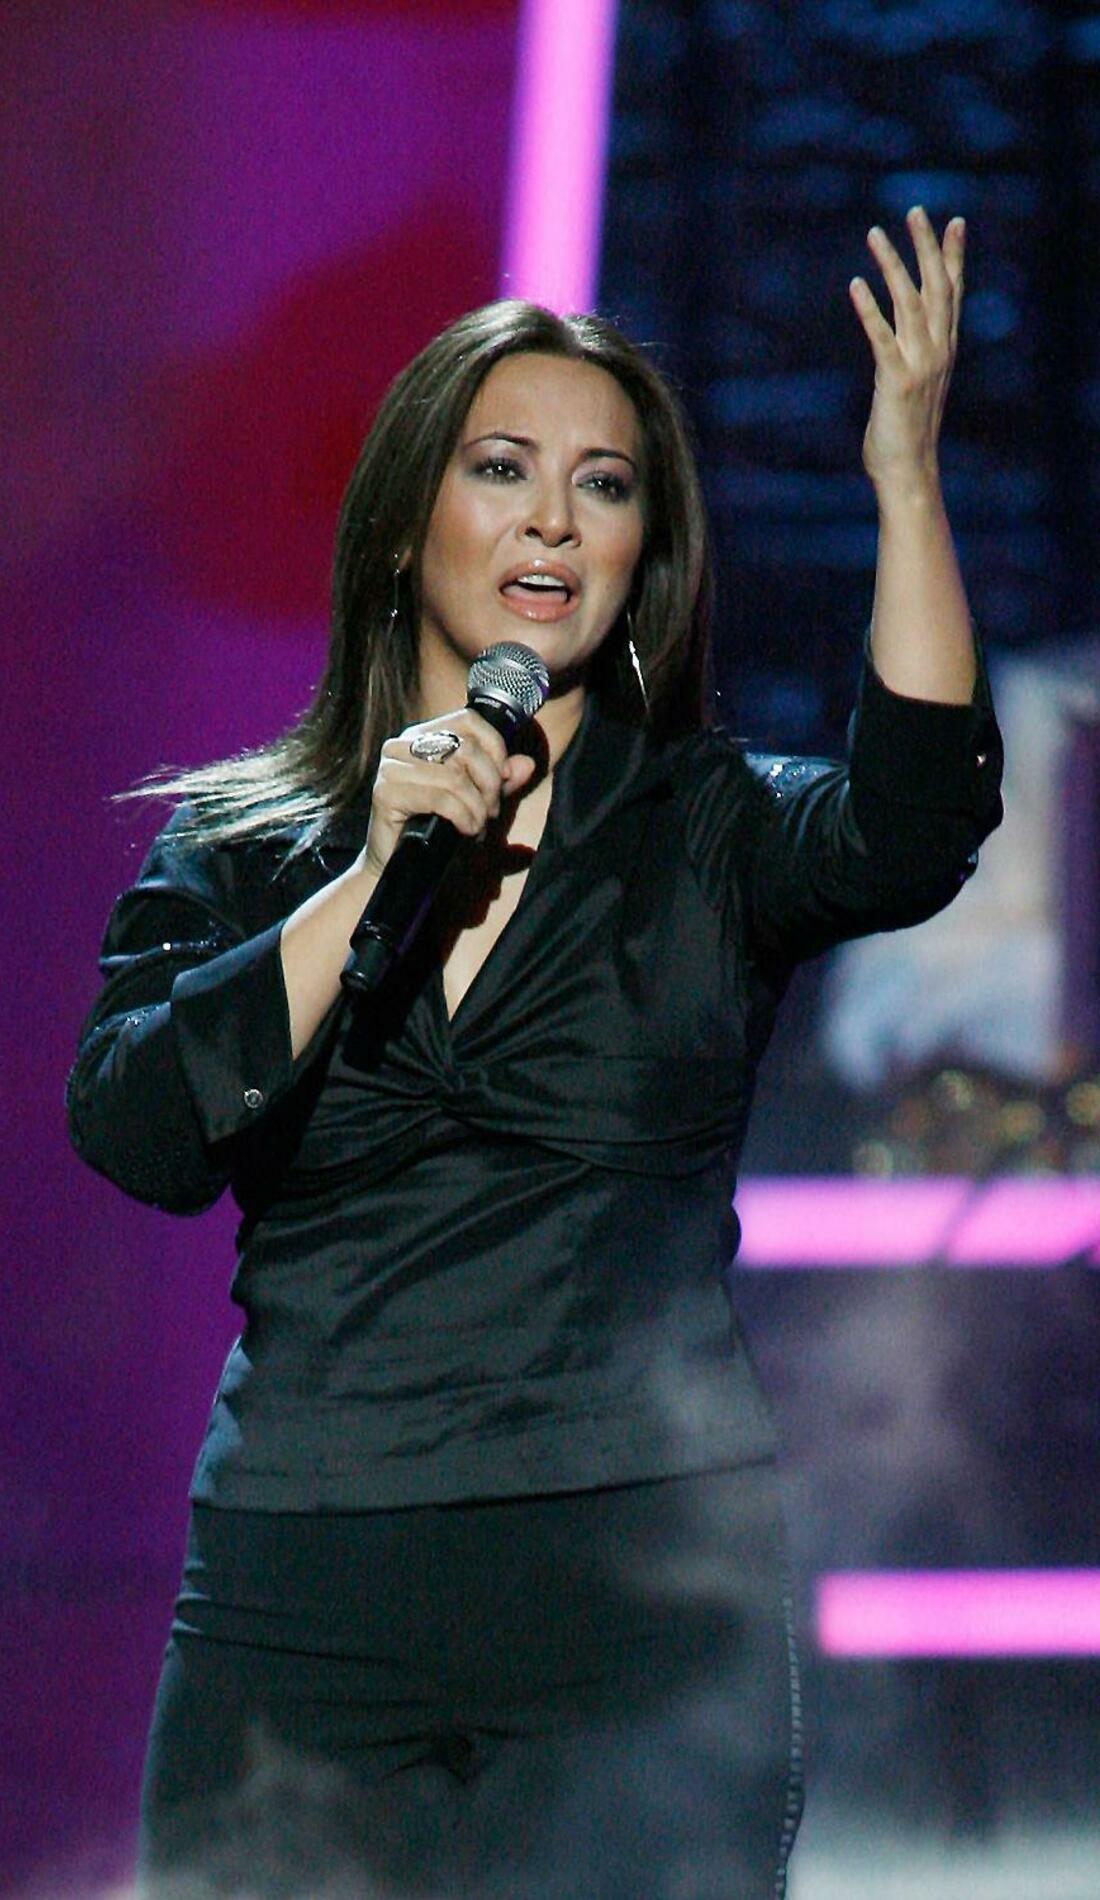 A Myriam Hernandez live event